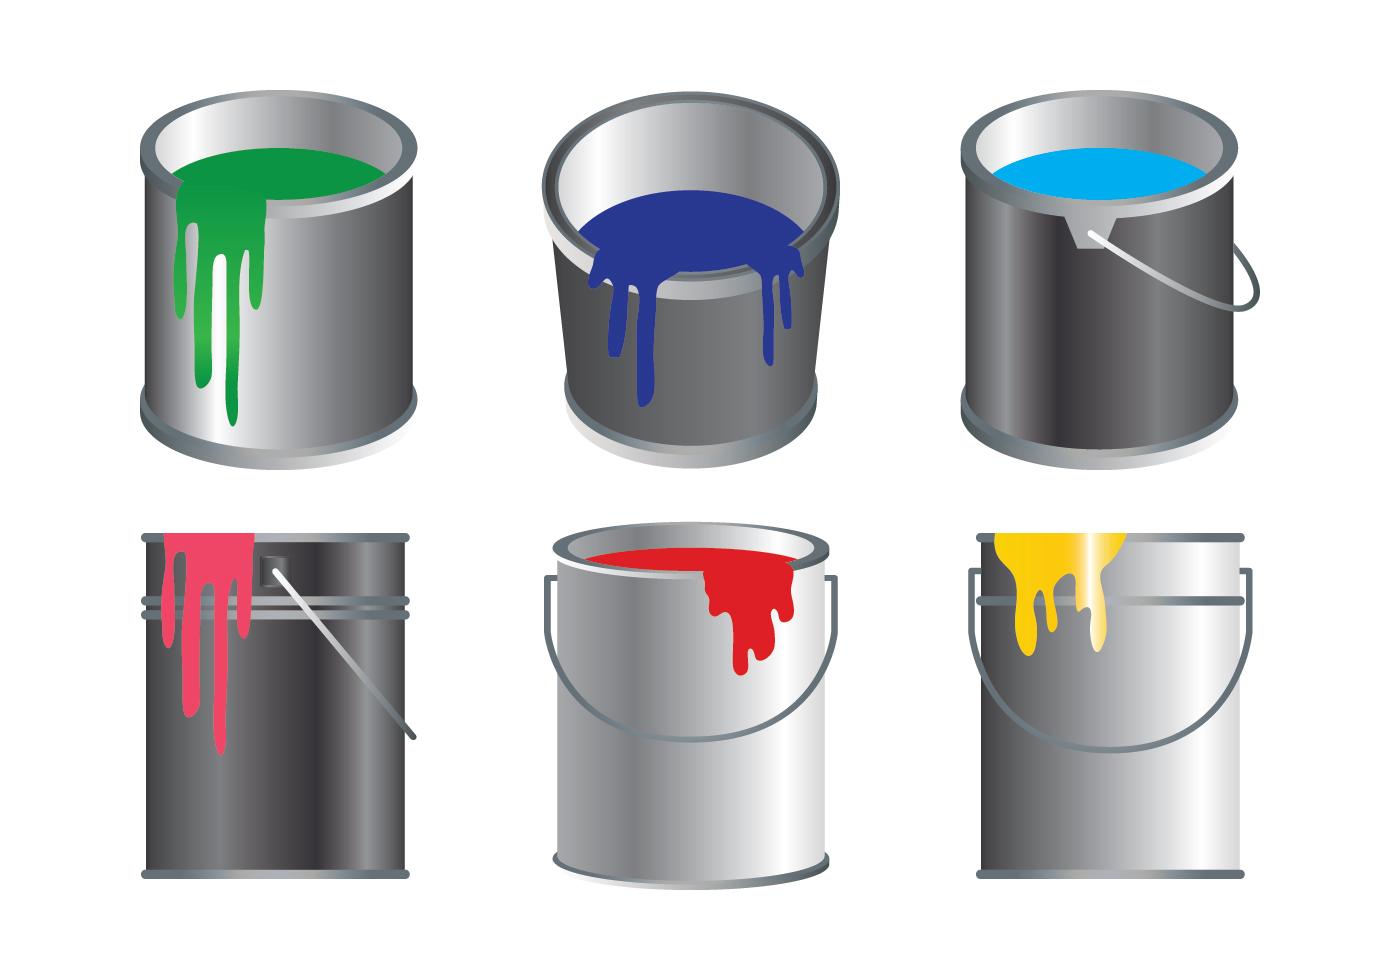 paint pot icons set download free vector art stock